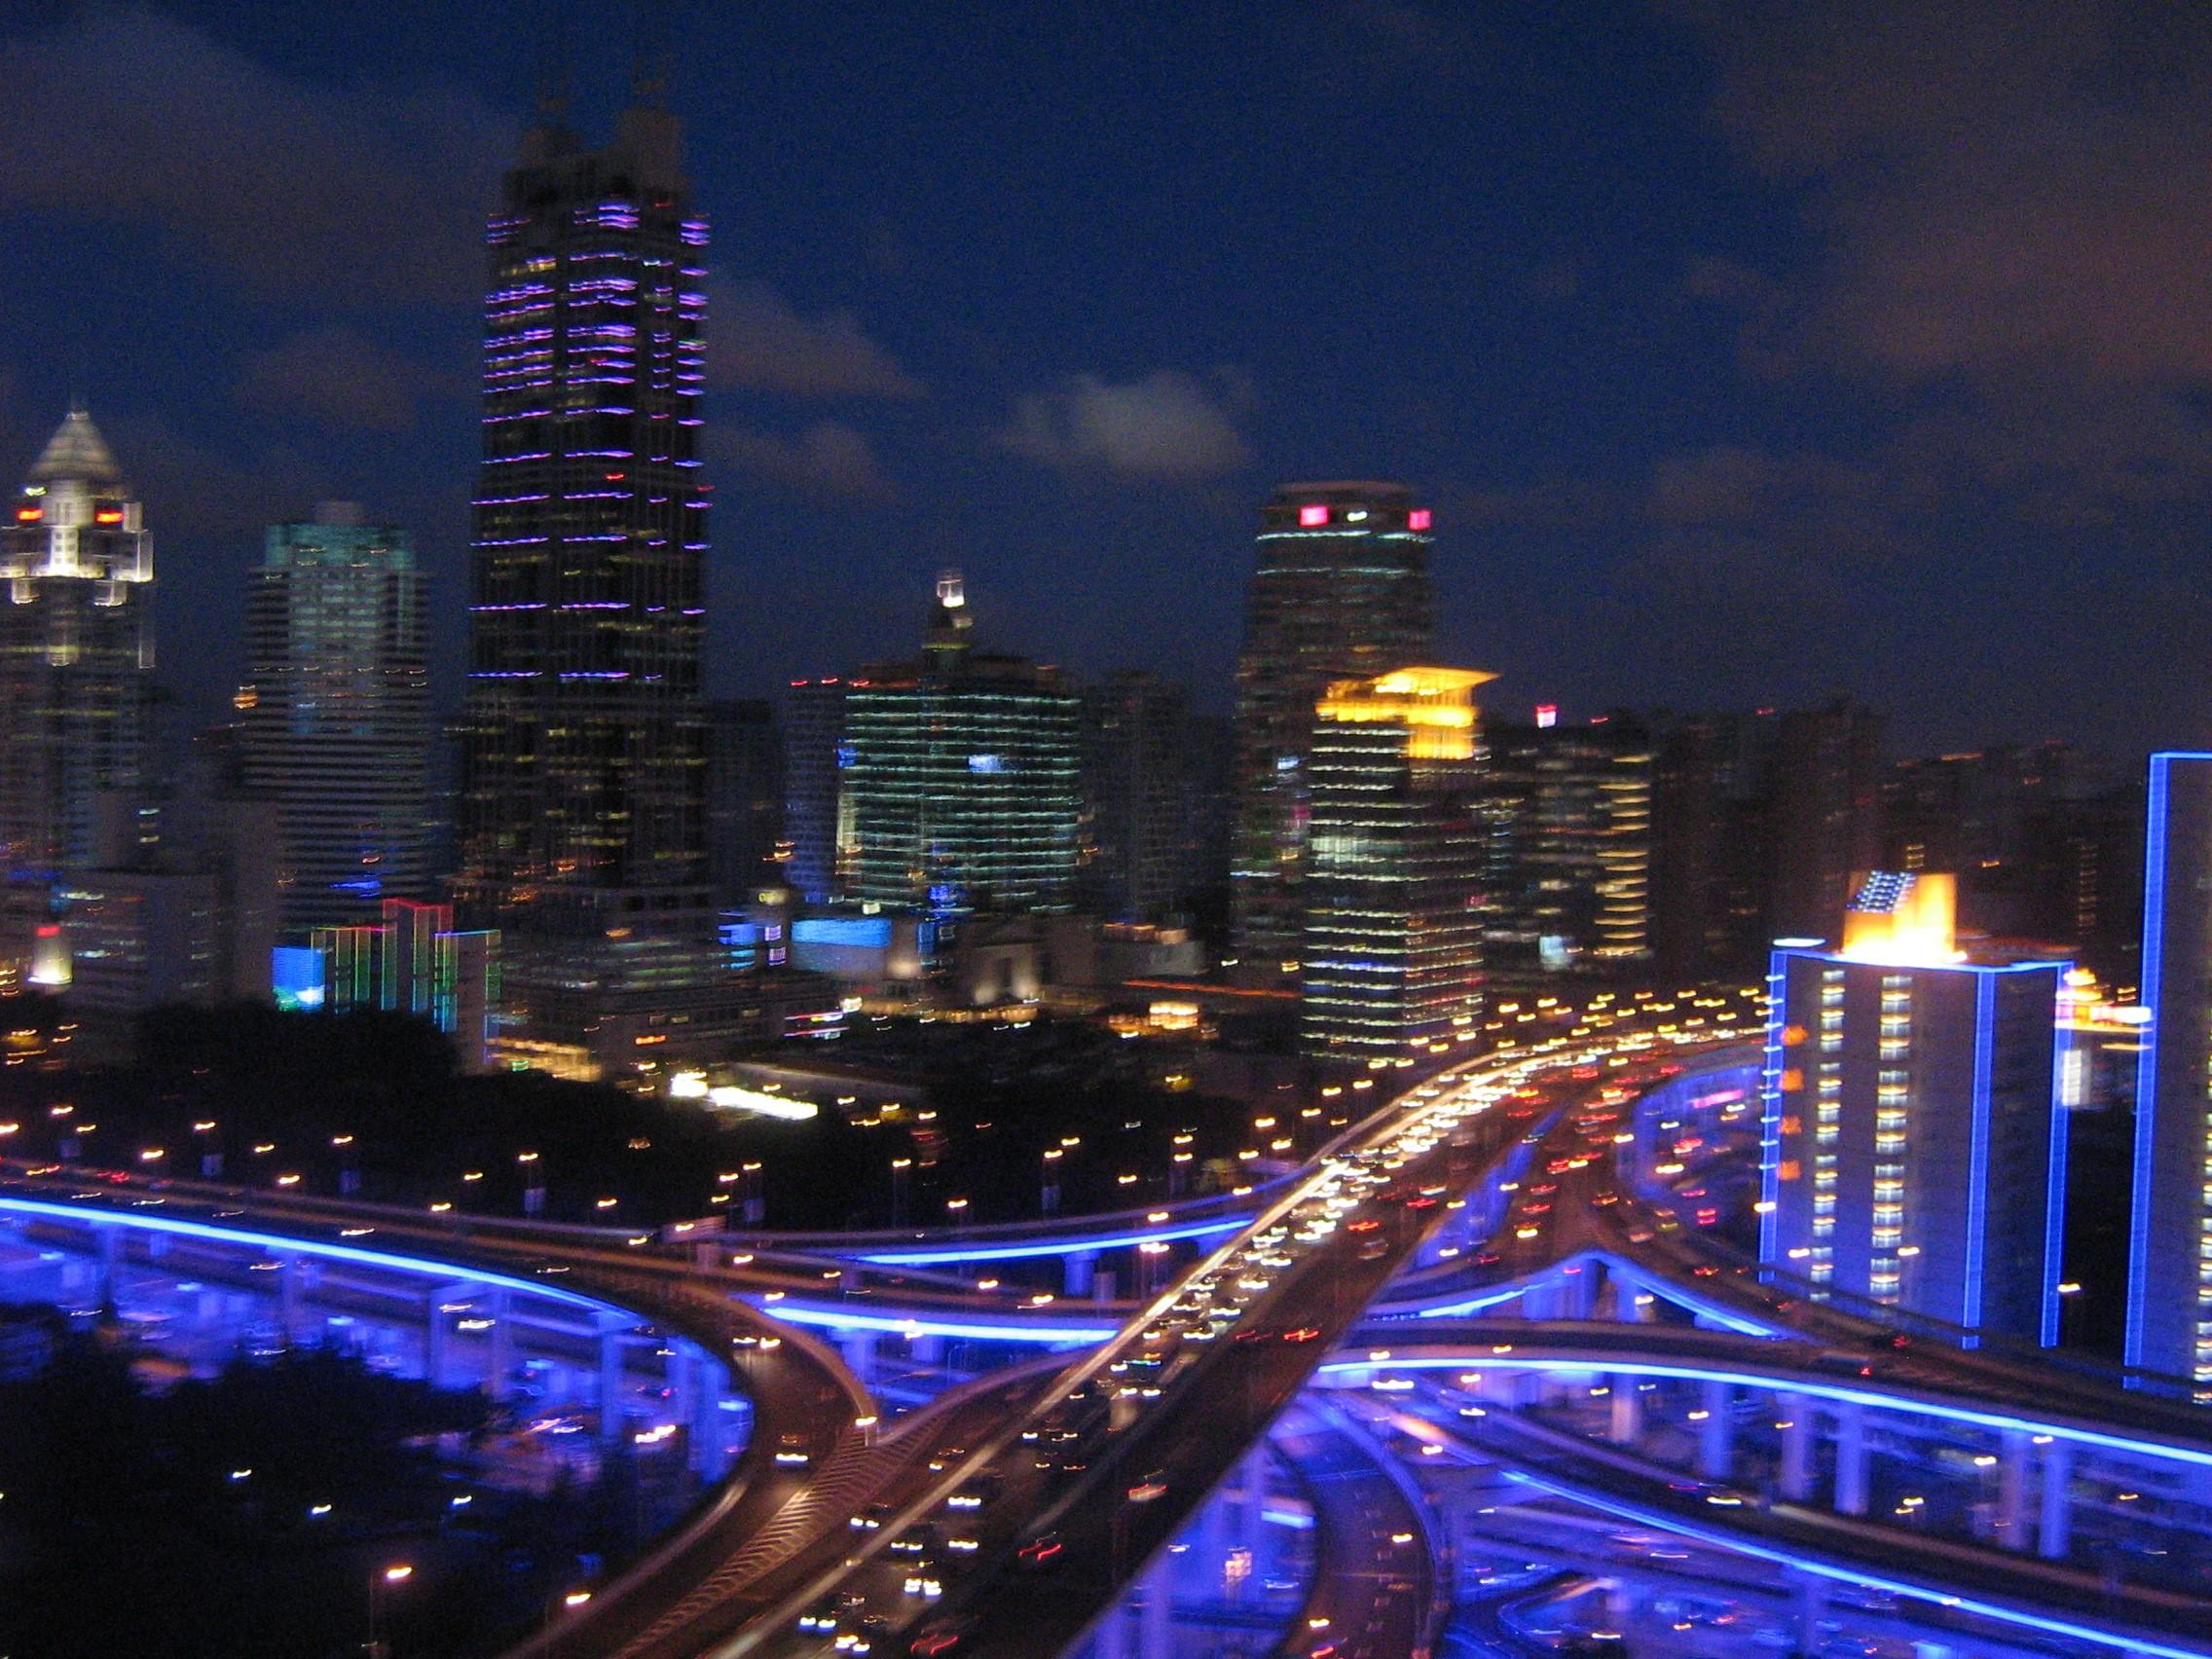 Le luci di Shanghai durante la notte